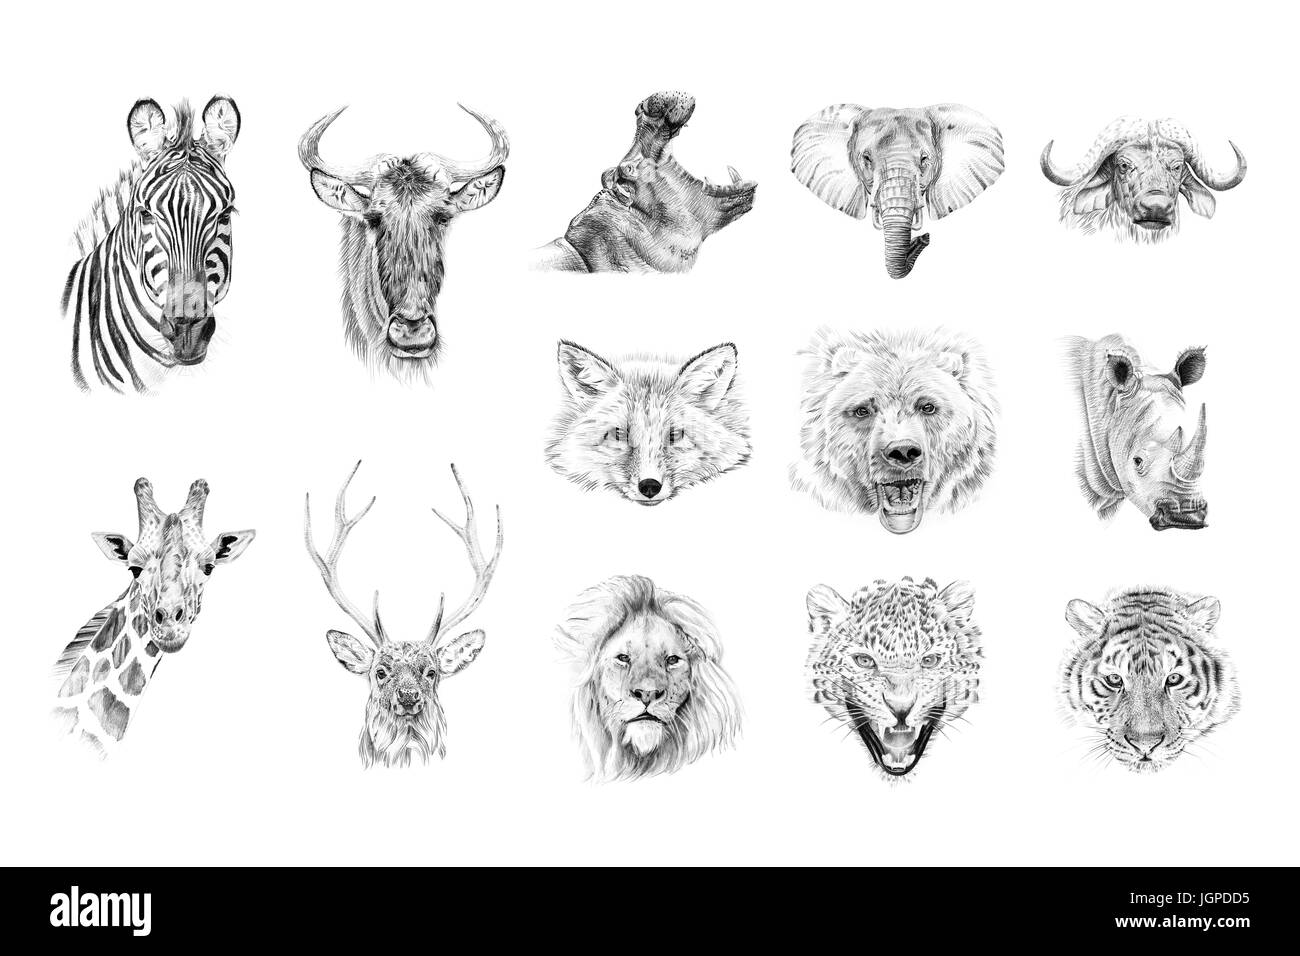 2864d4c66e6 Portrait of animals drawn by hand in pencil. Originals